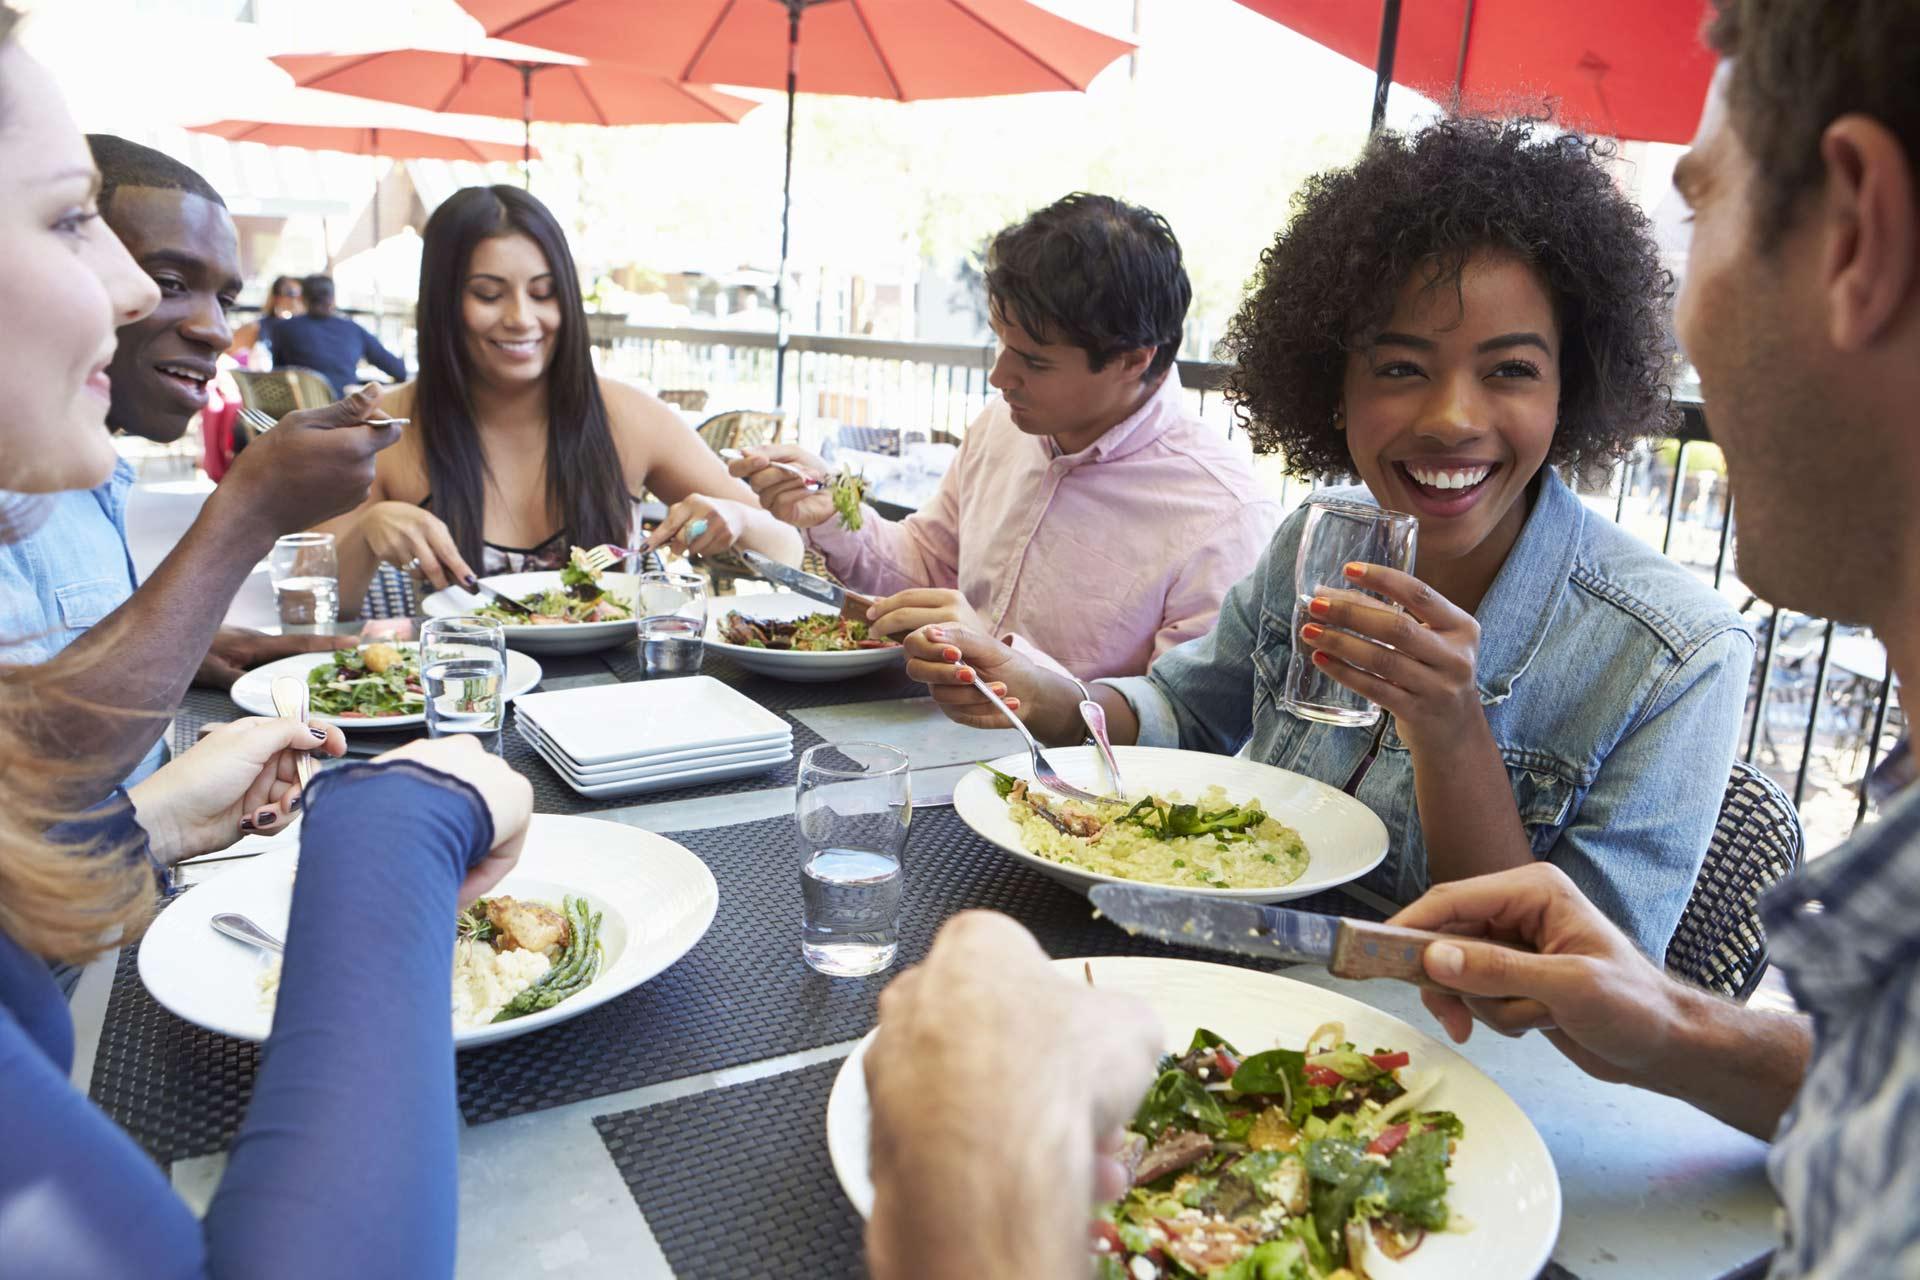 Commercial Water Softeners Industries We Serve - Restaurants